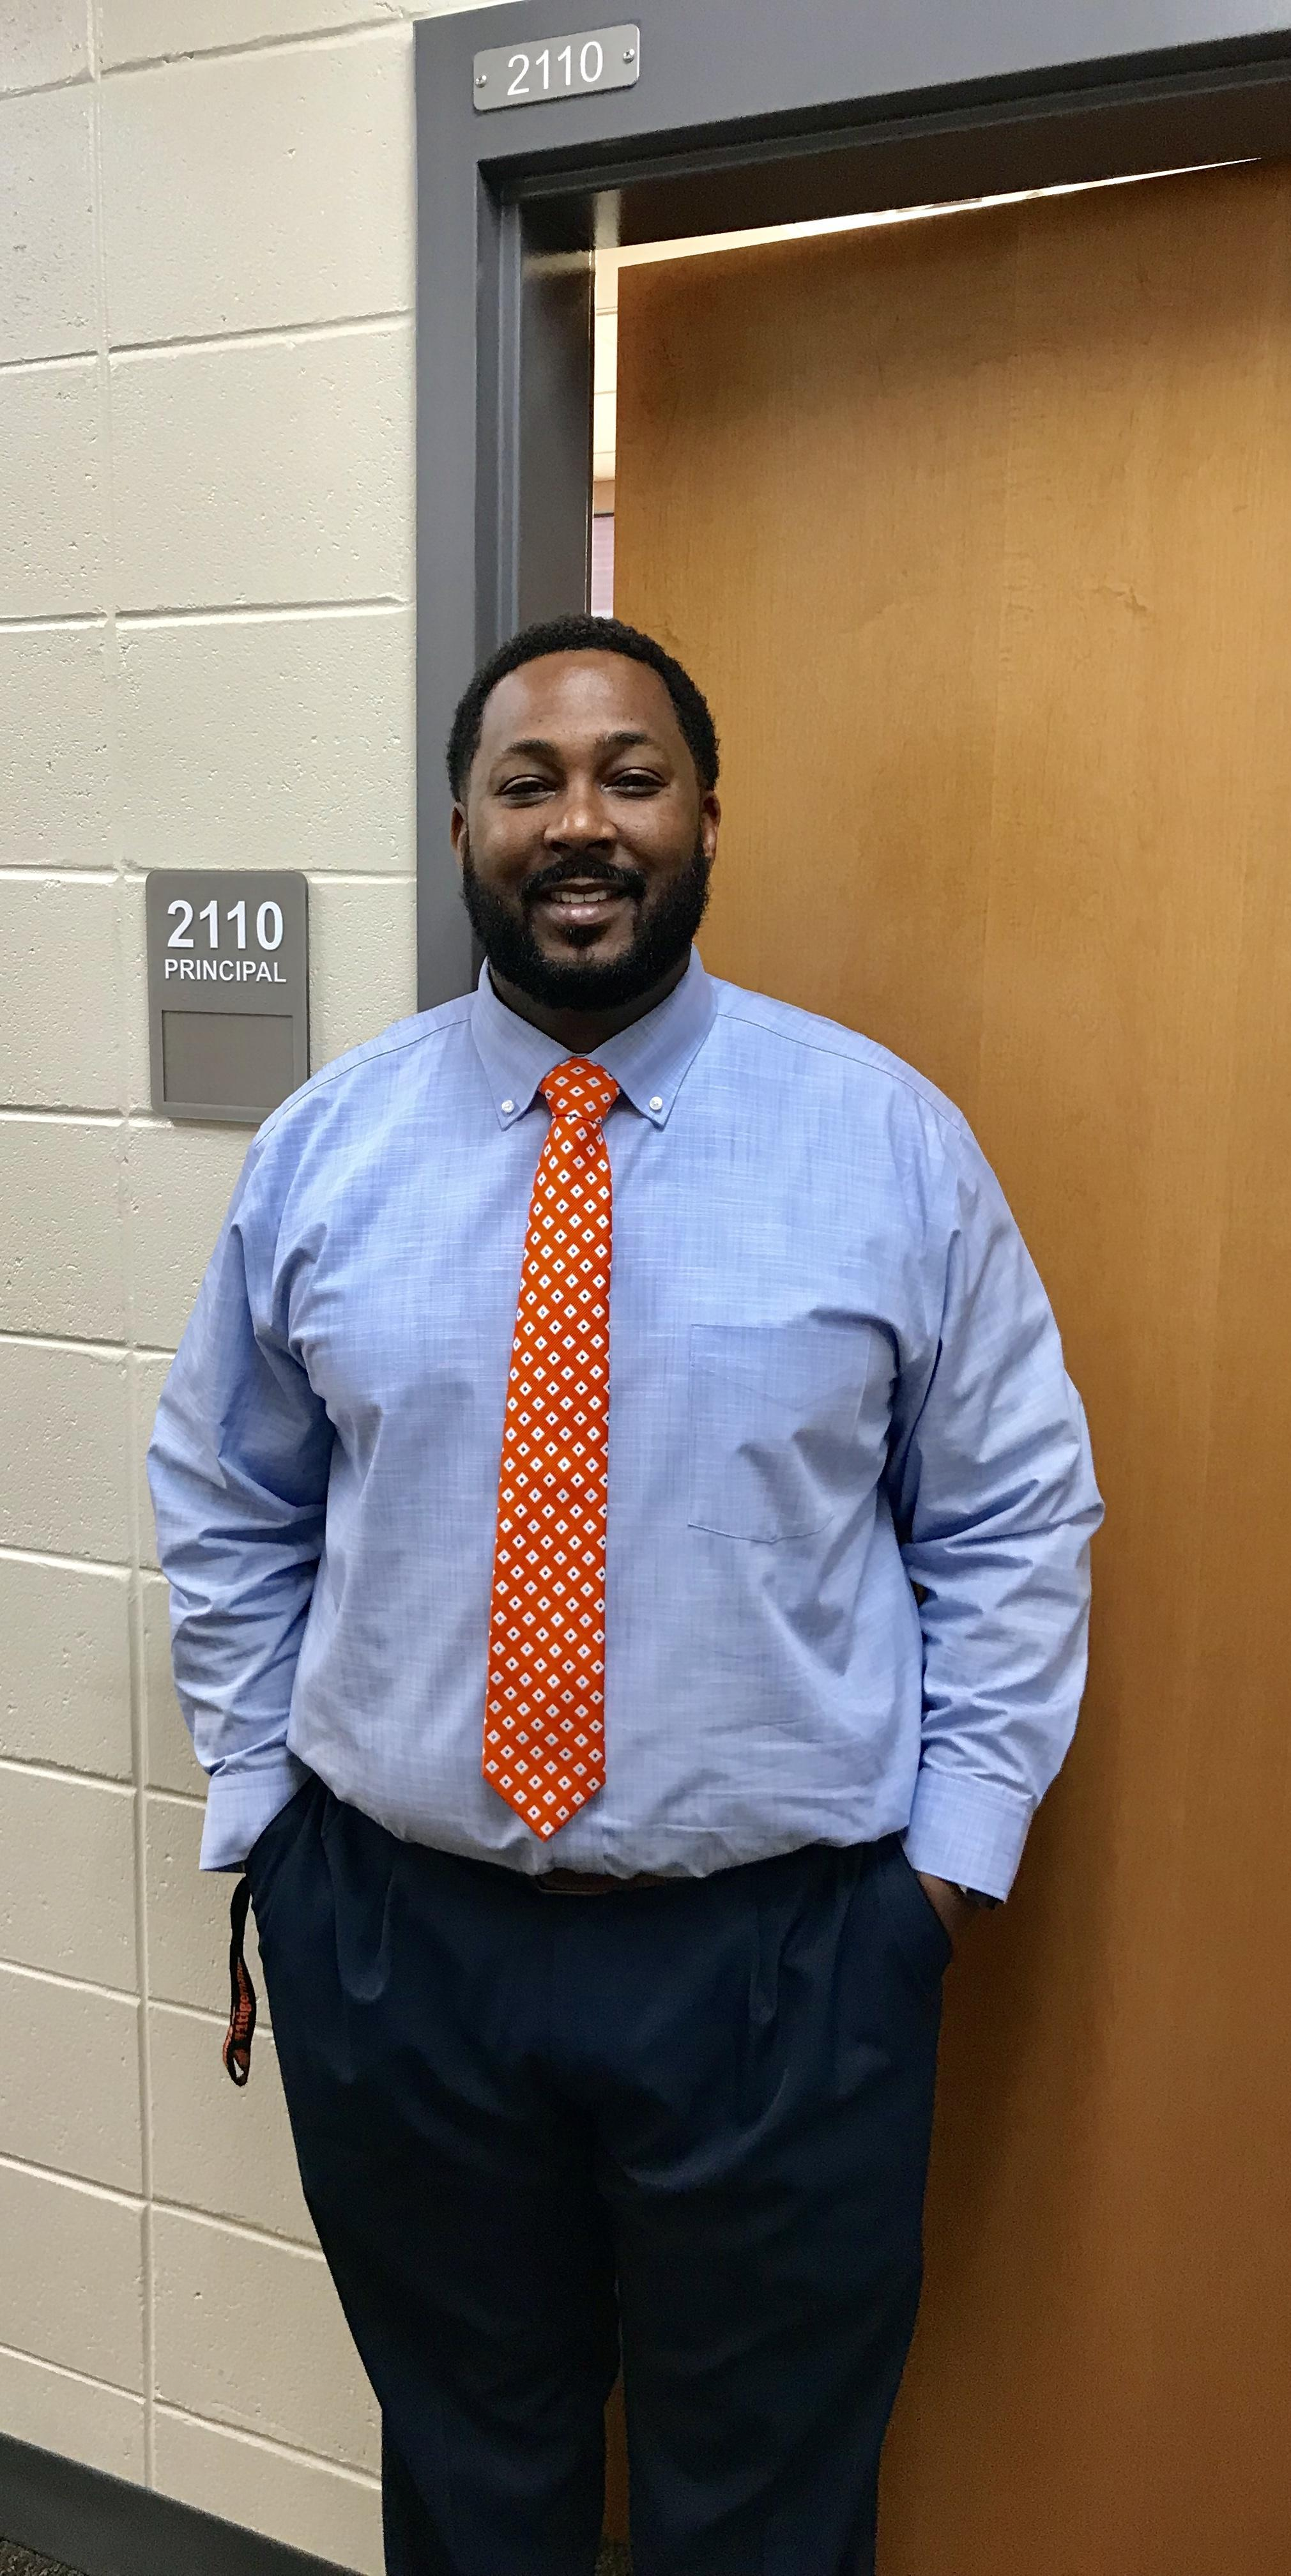 Mr. Thomas, Principal